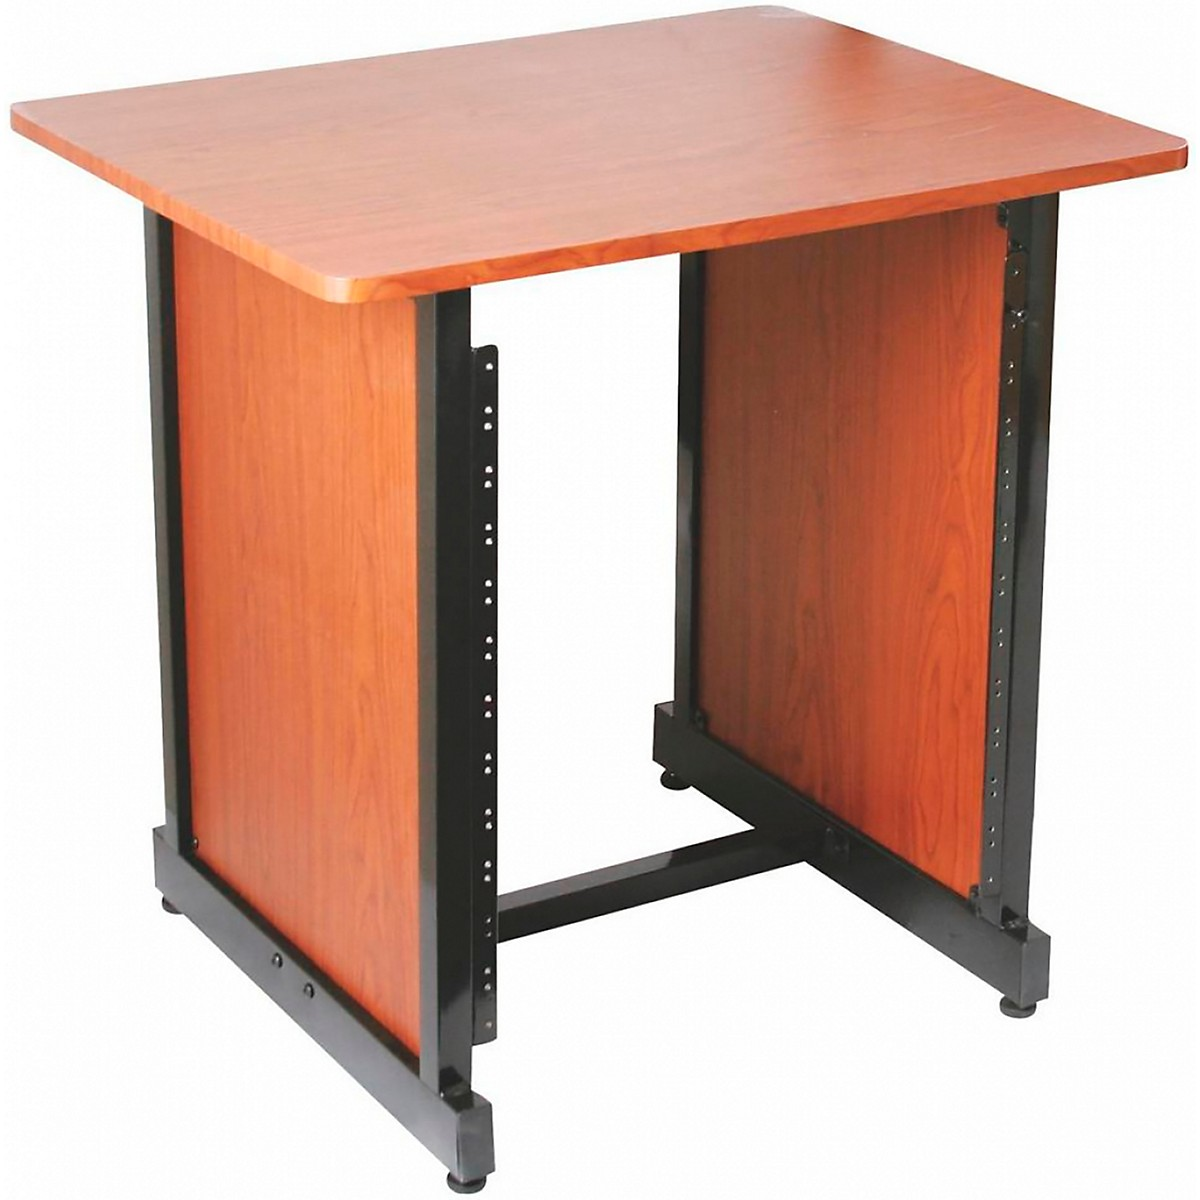 On-Stage WSR7500RB Workstation Corner Accessory (Rosewood)